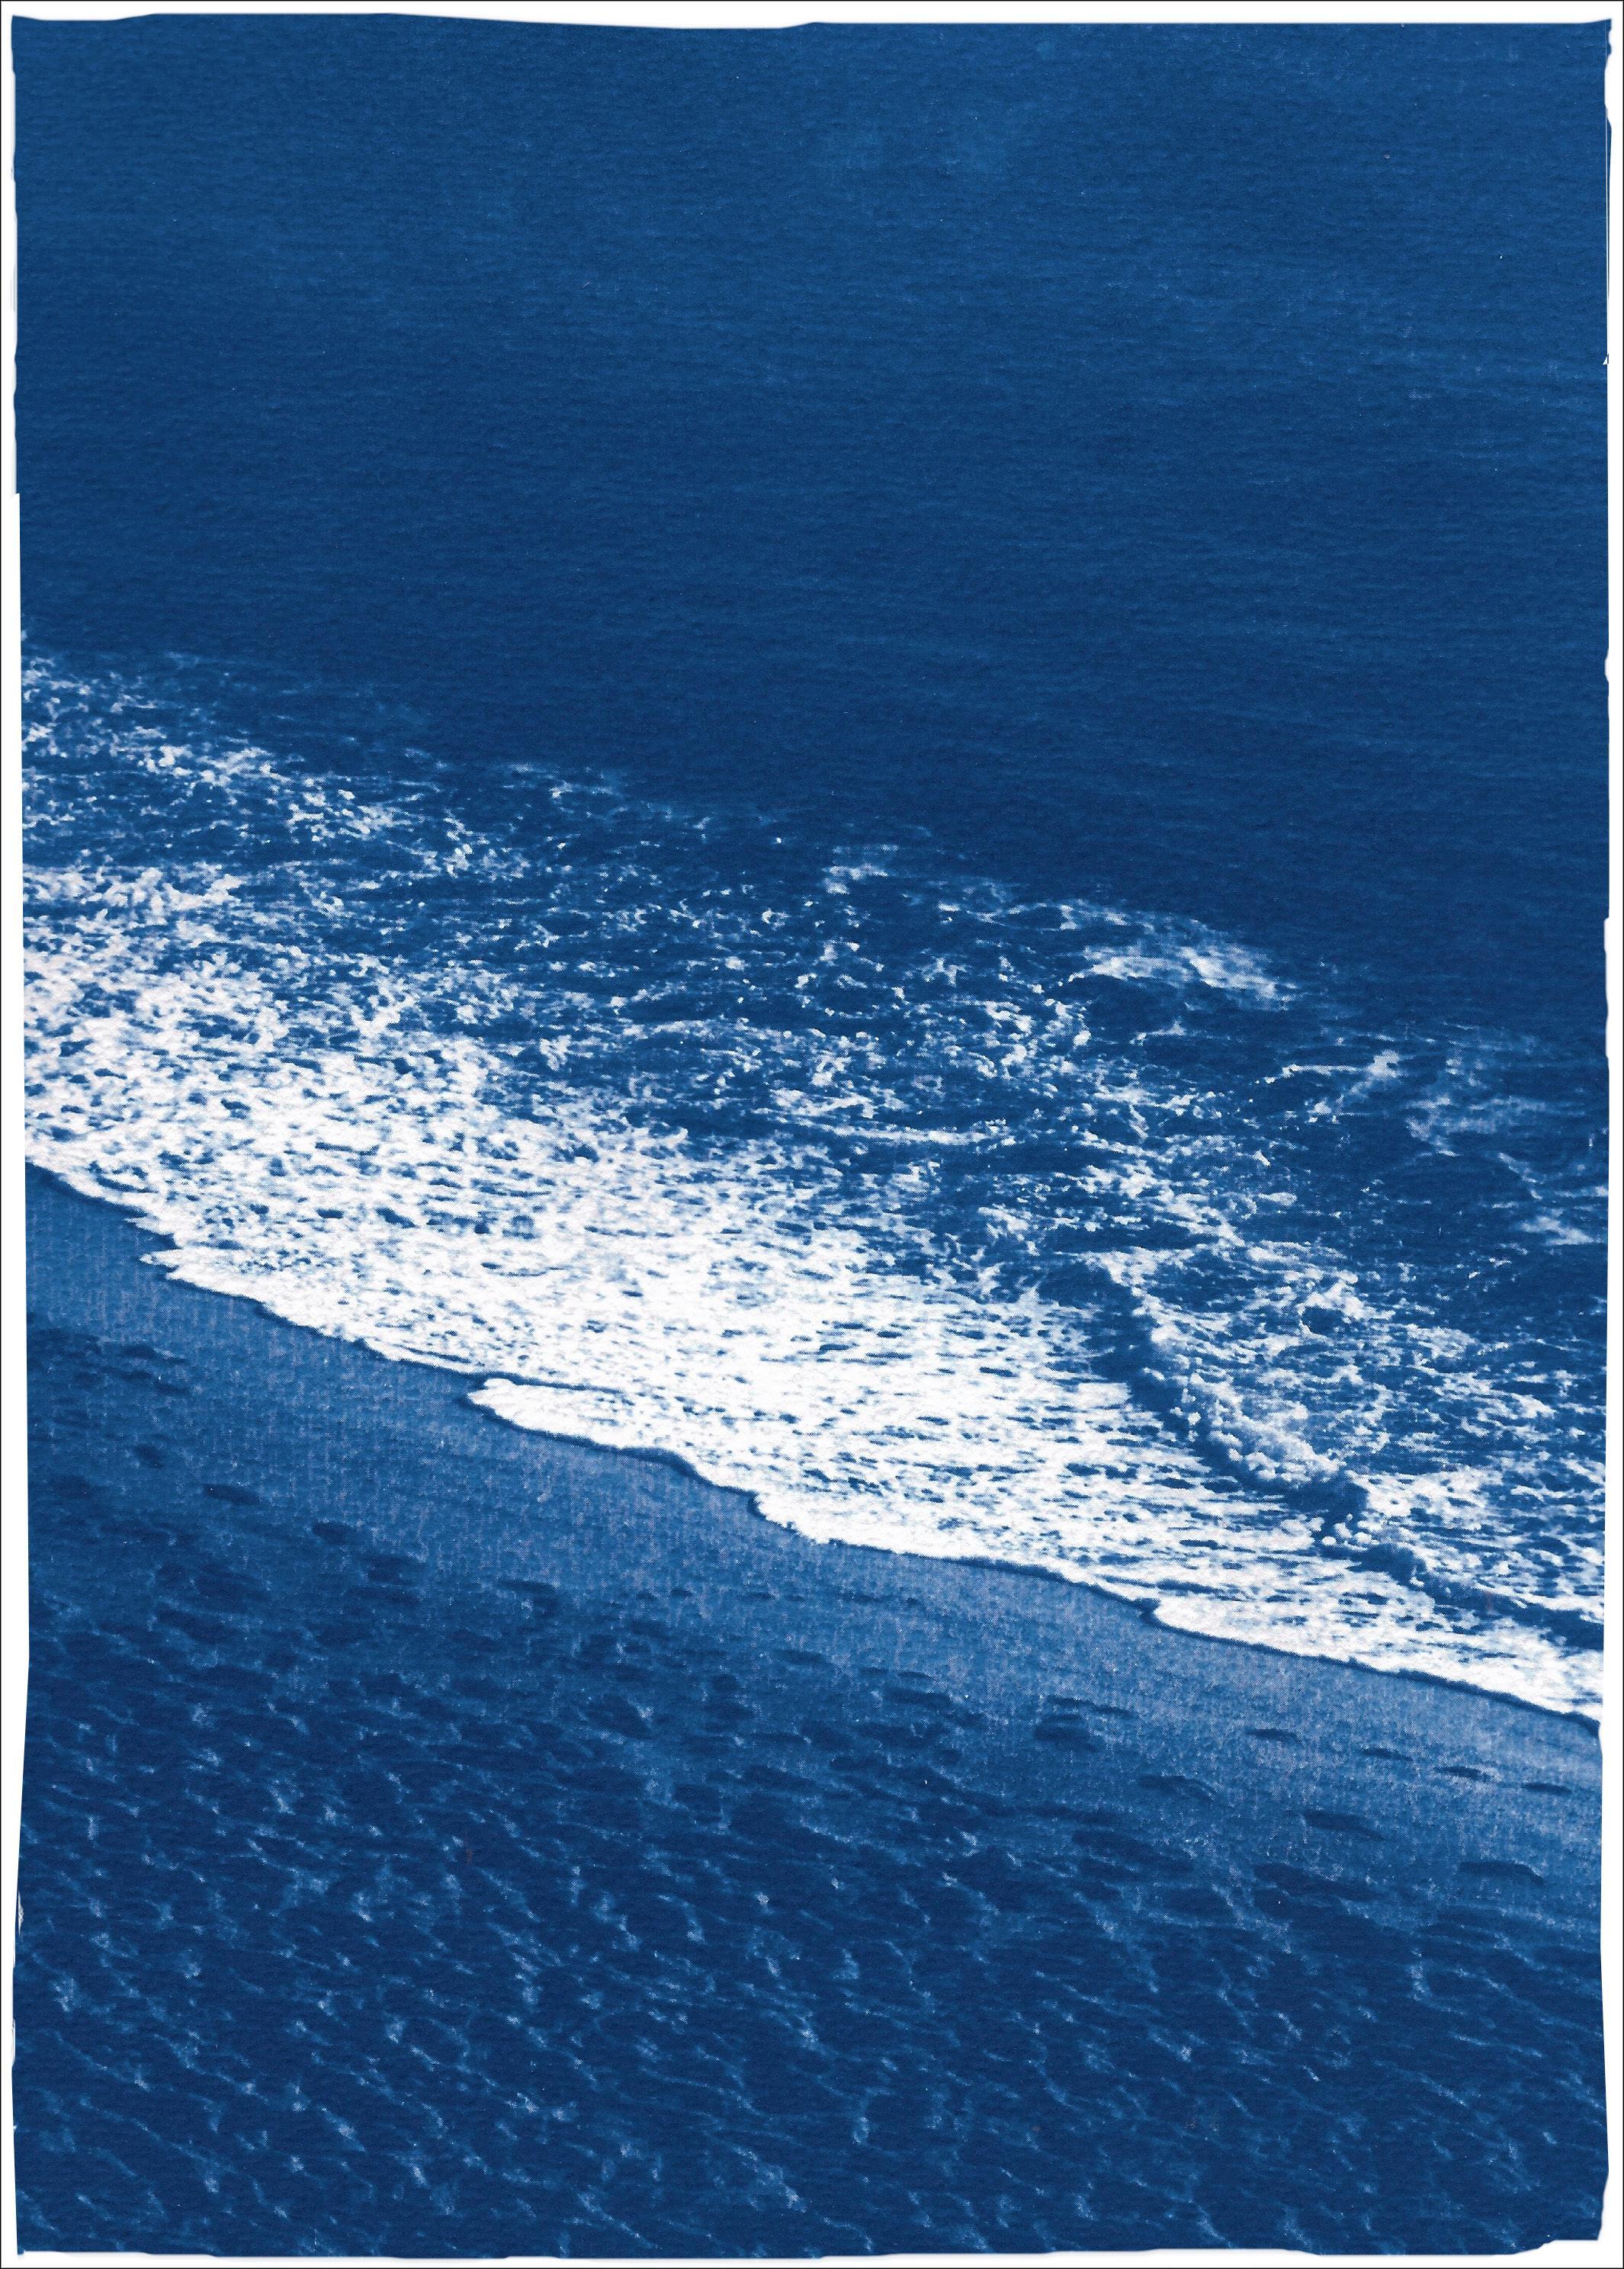 Sandy Shore with Foam, Nautical Cyanotype Print on Watercolor Paper, Beach Coast